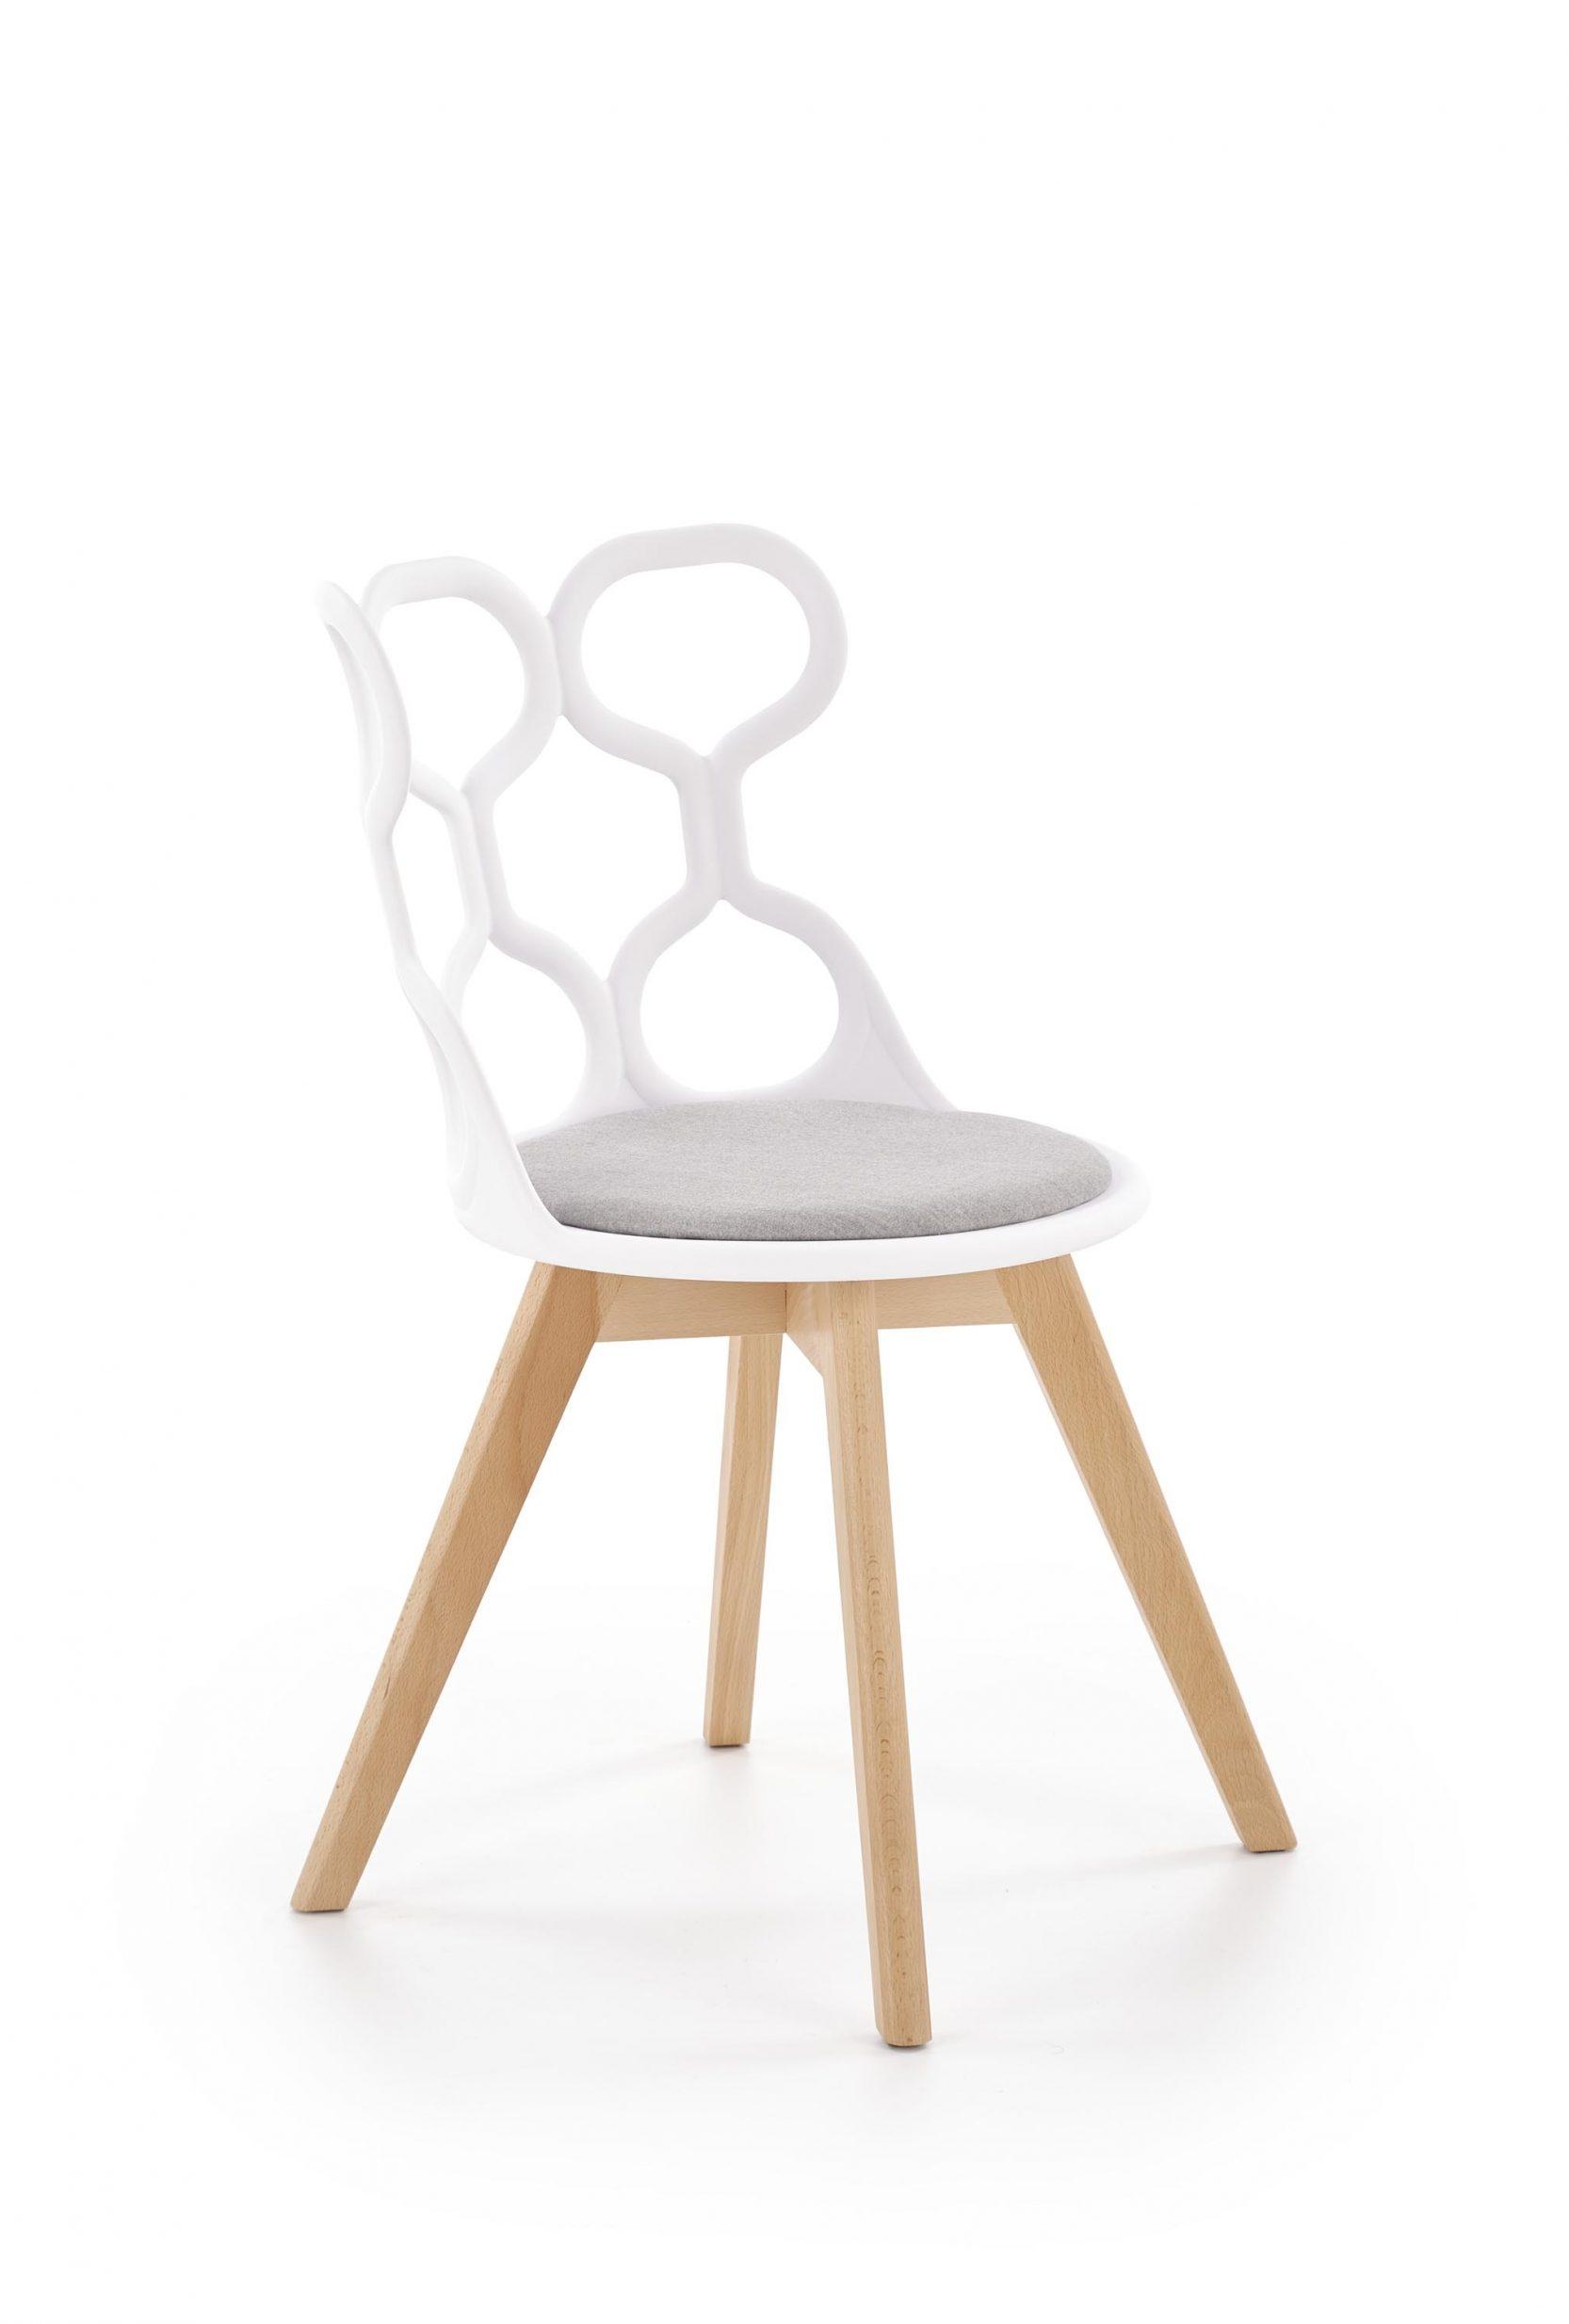 Scaun din plastic cu sezut tapitat cu stofa si picioare din lemn K308 Alb / Gri / Natural l43xA50xH80 cm